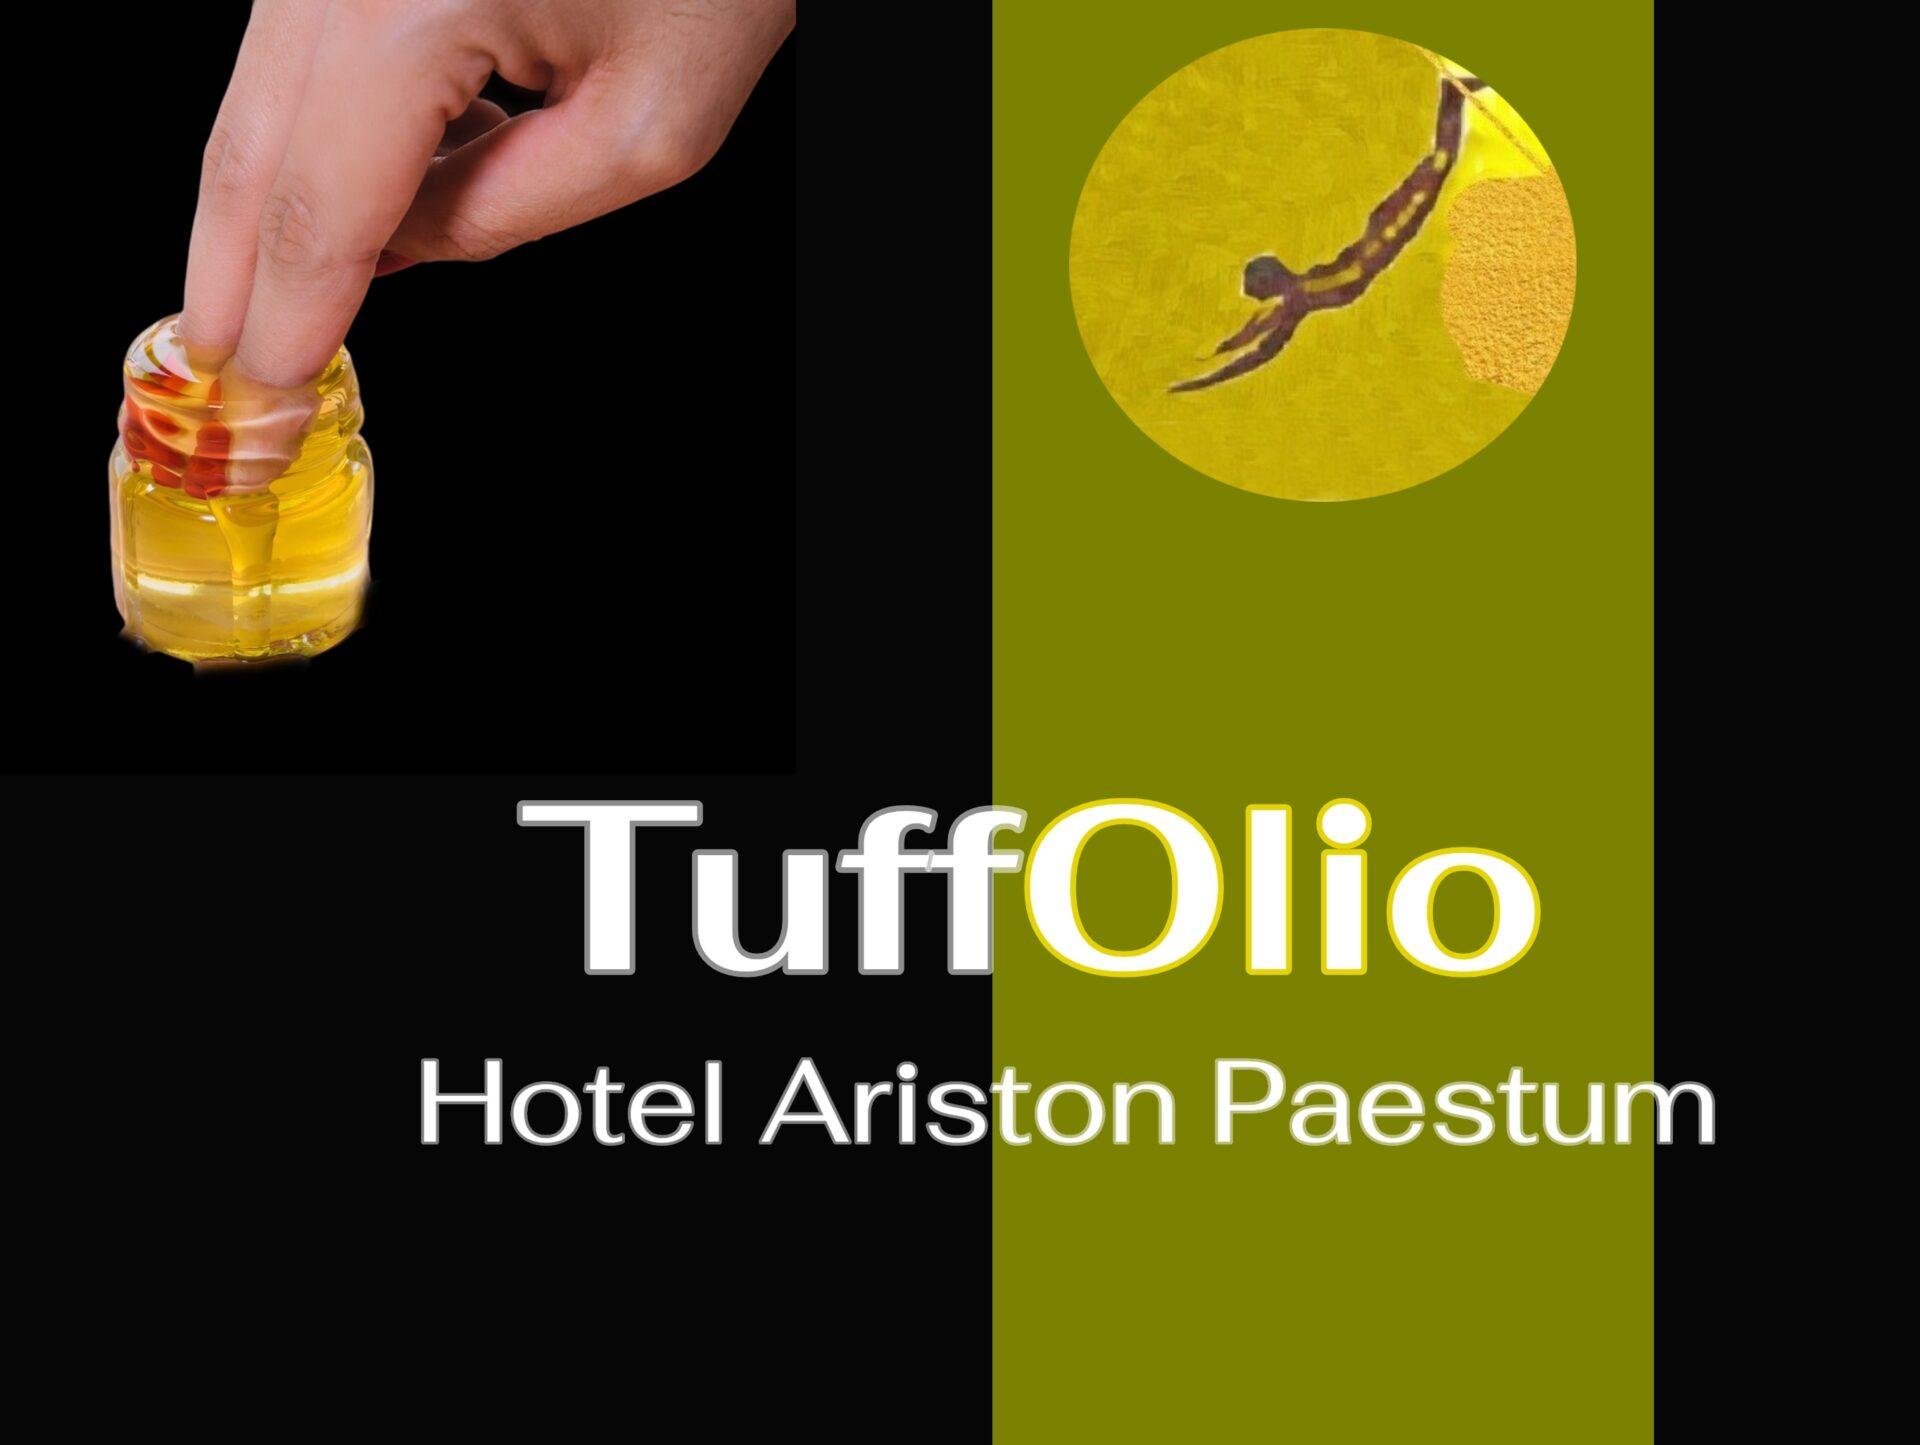 TuffOlio 2020